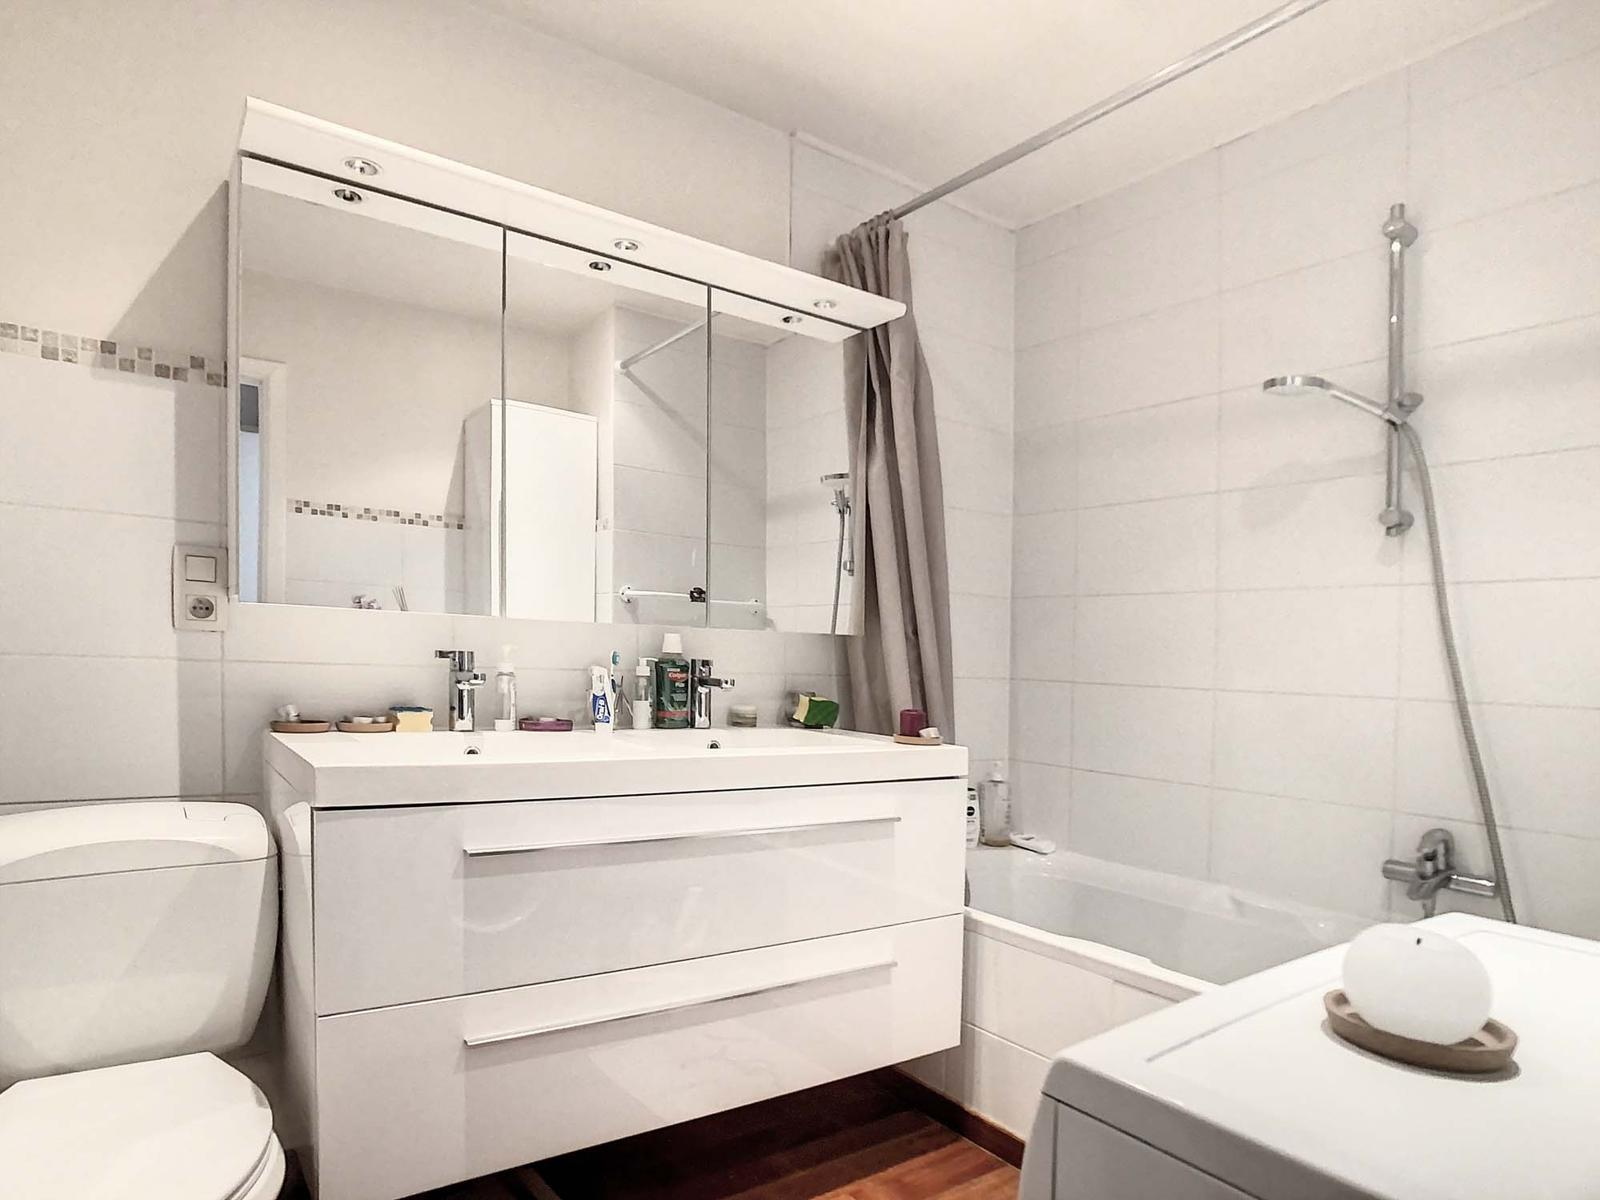 Appartement - Woluwe-Saint-Lambert - #4521382-6